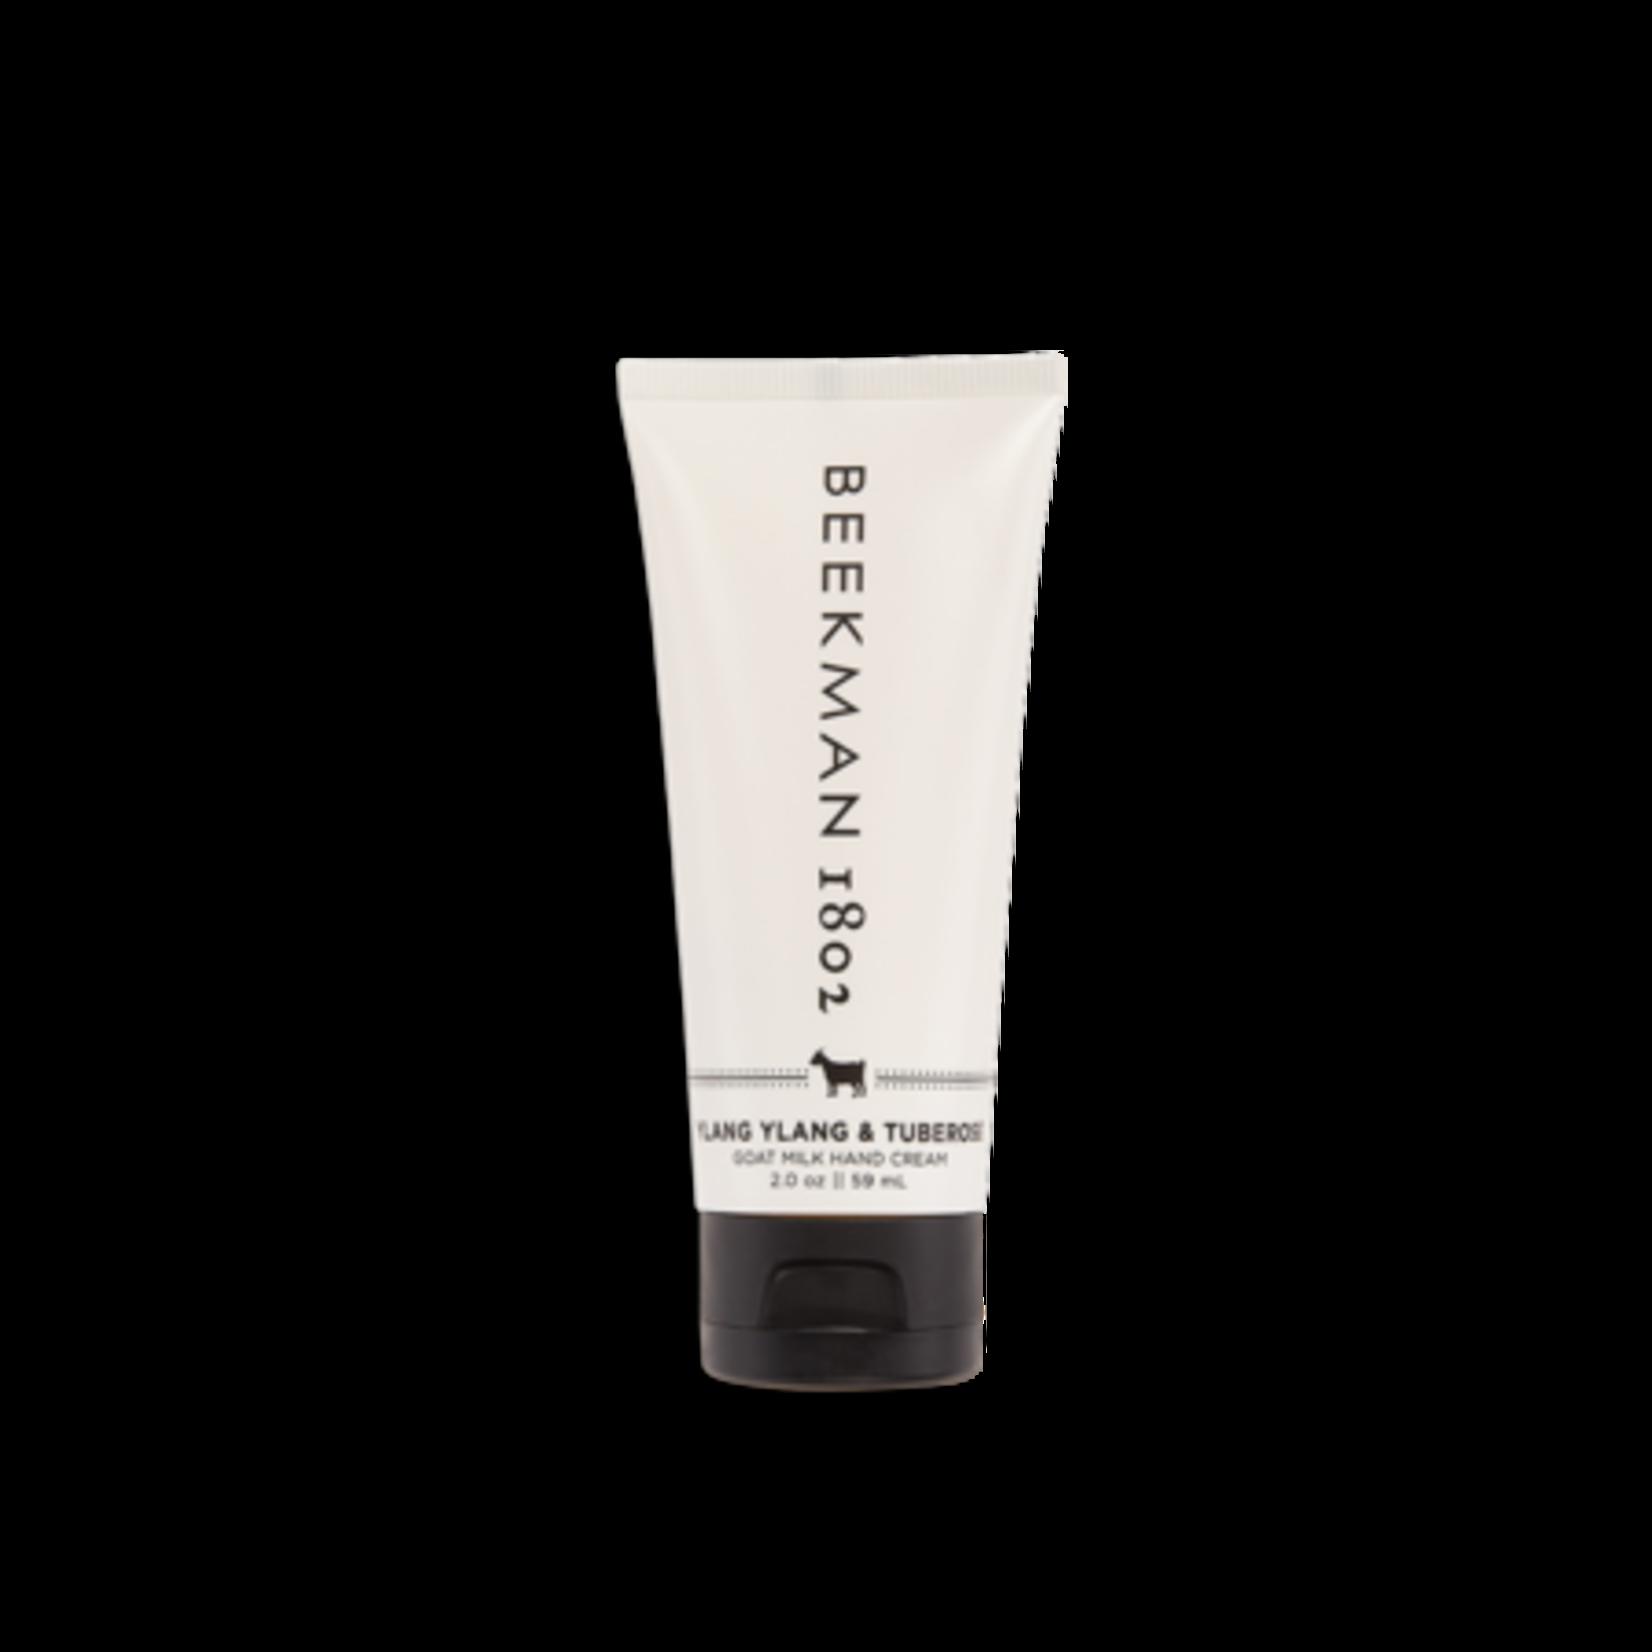 BEEKMAN 1802 Ylang Ylang & Tuberose Hand Cream